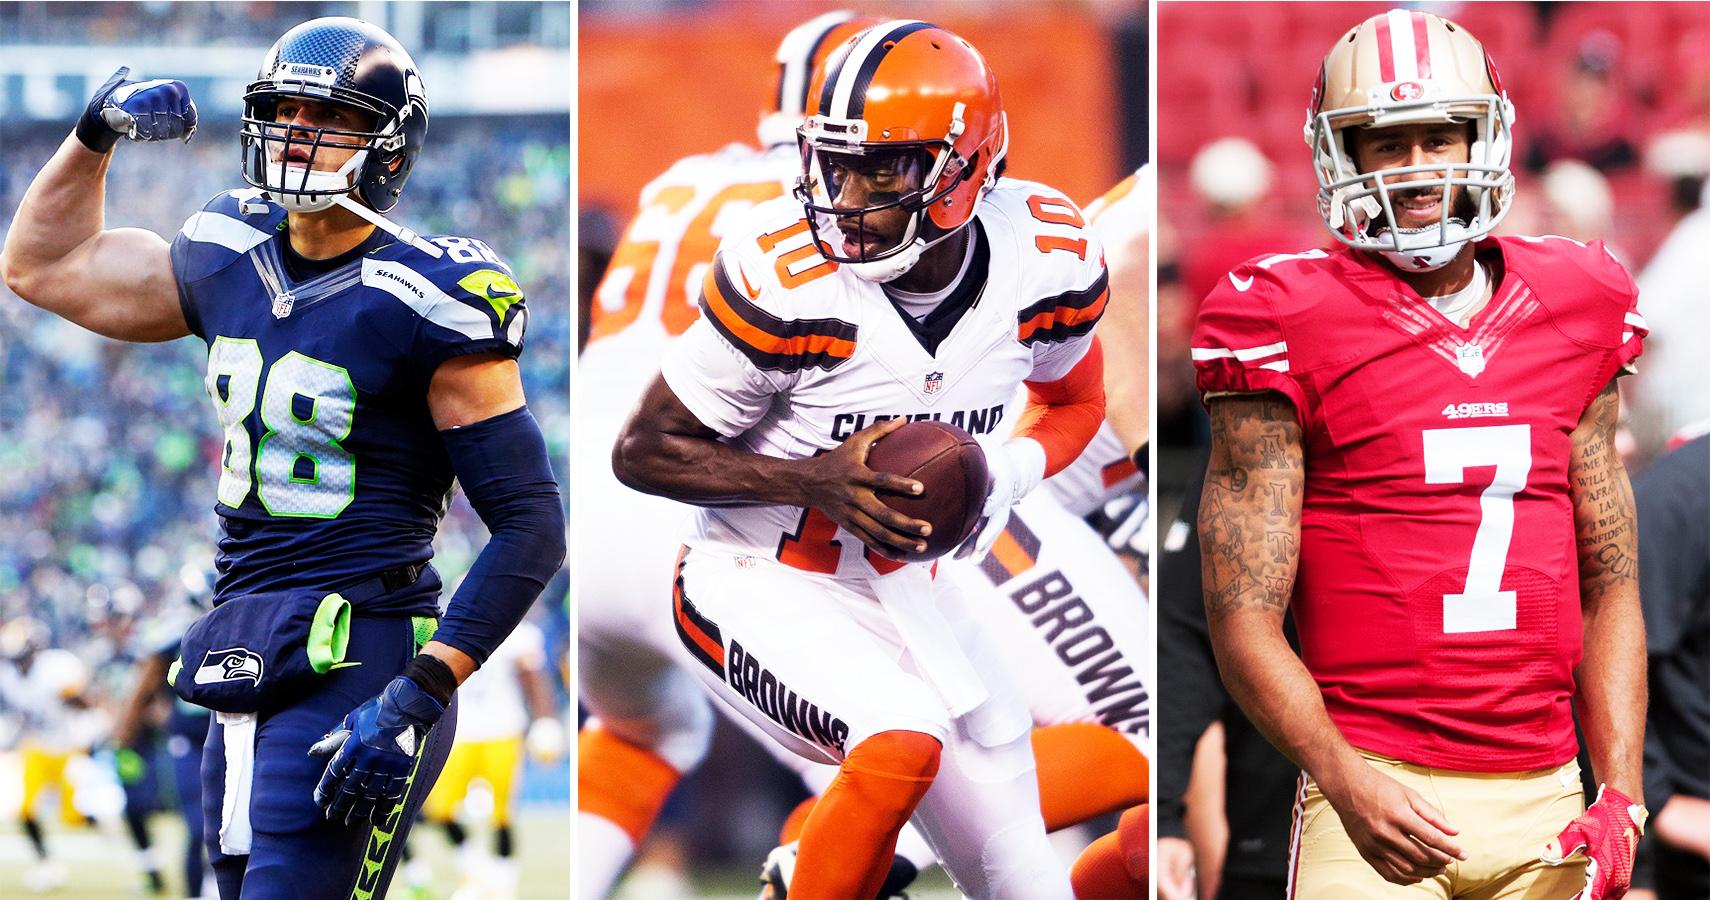 Mock: Giants pick Lock, Jets land star WR